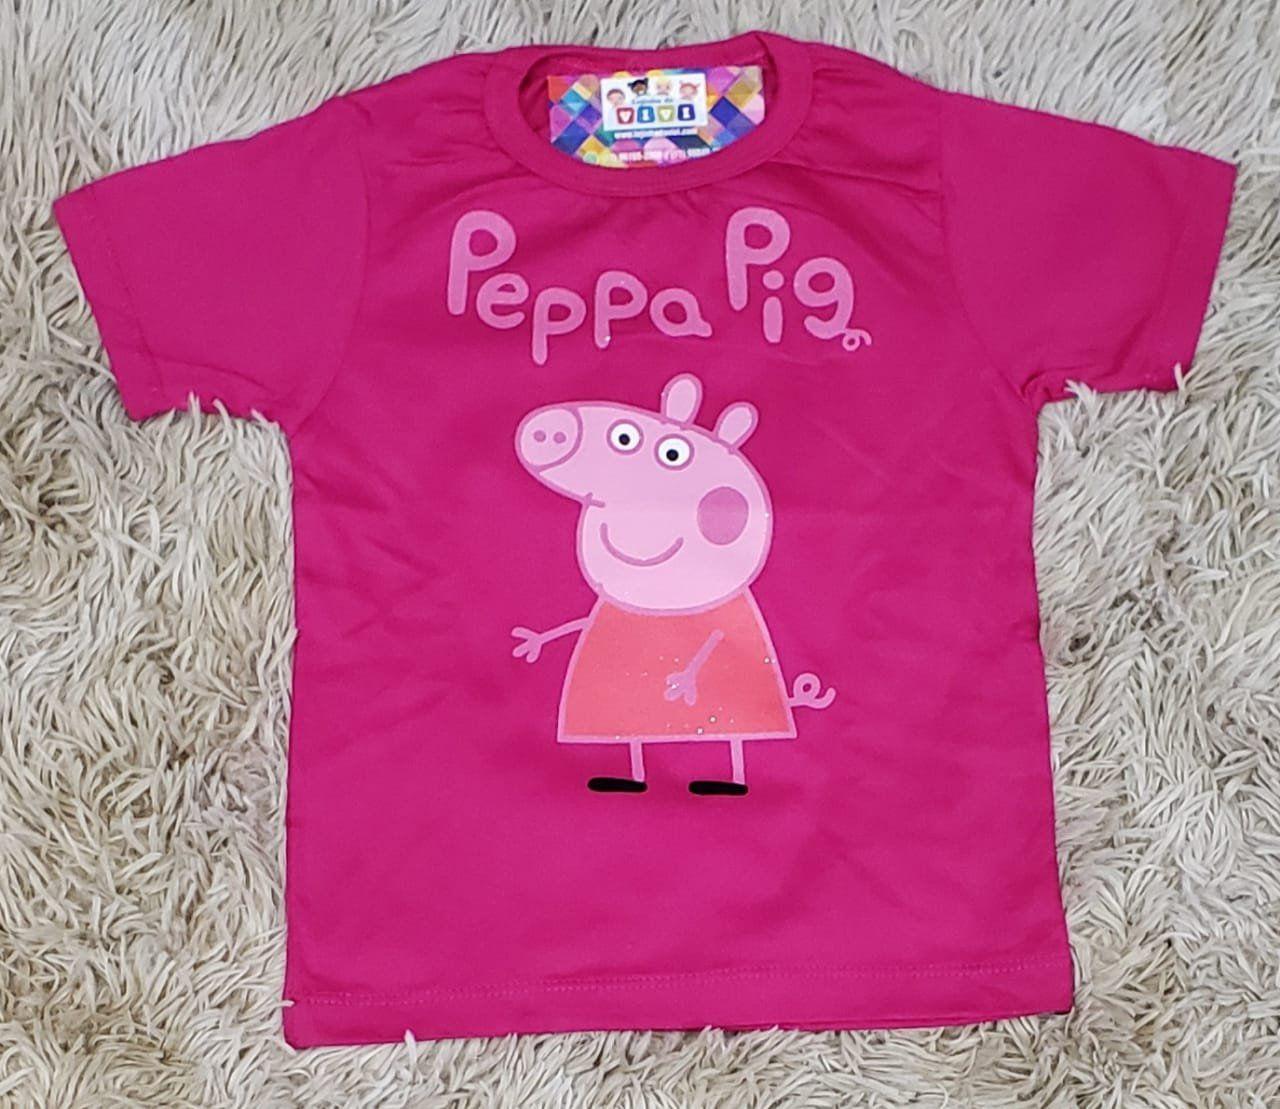 ca18327ae7 Camiseta Peppa Pig Rosa